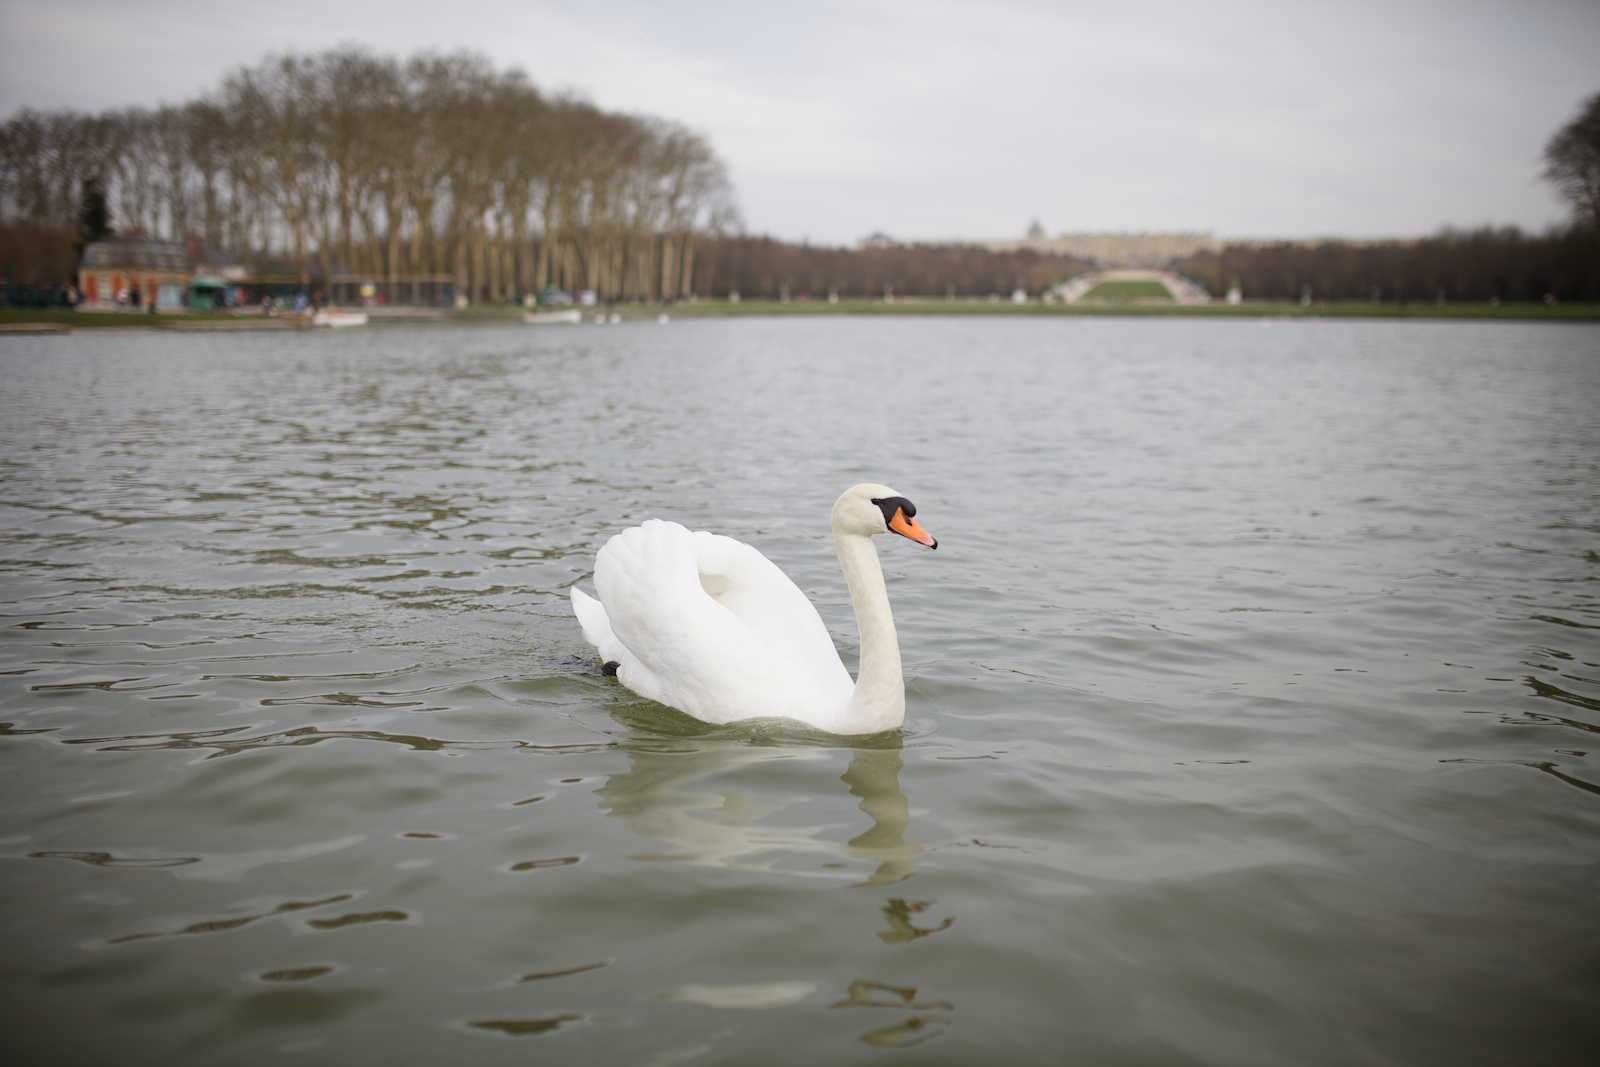 Paris Off the Beaten Path: Quiet Spots in the City